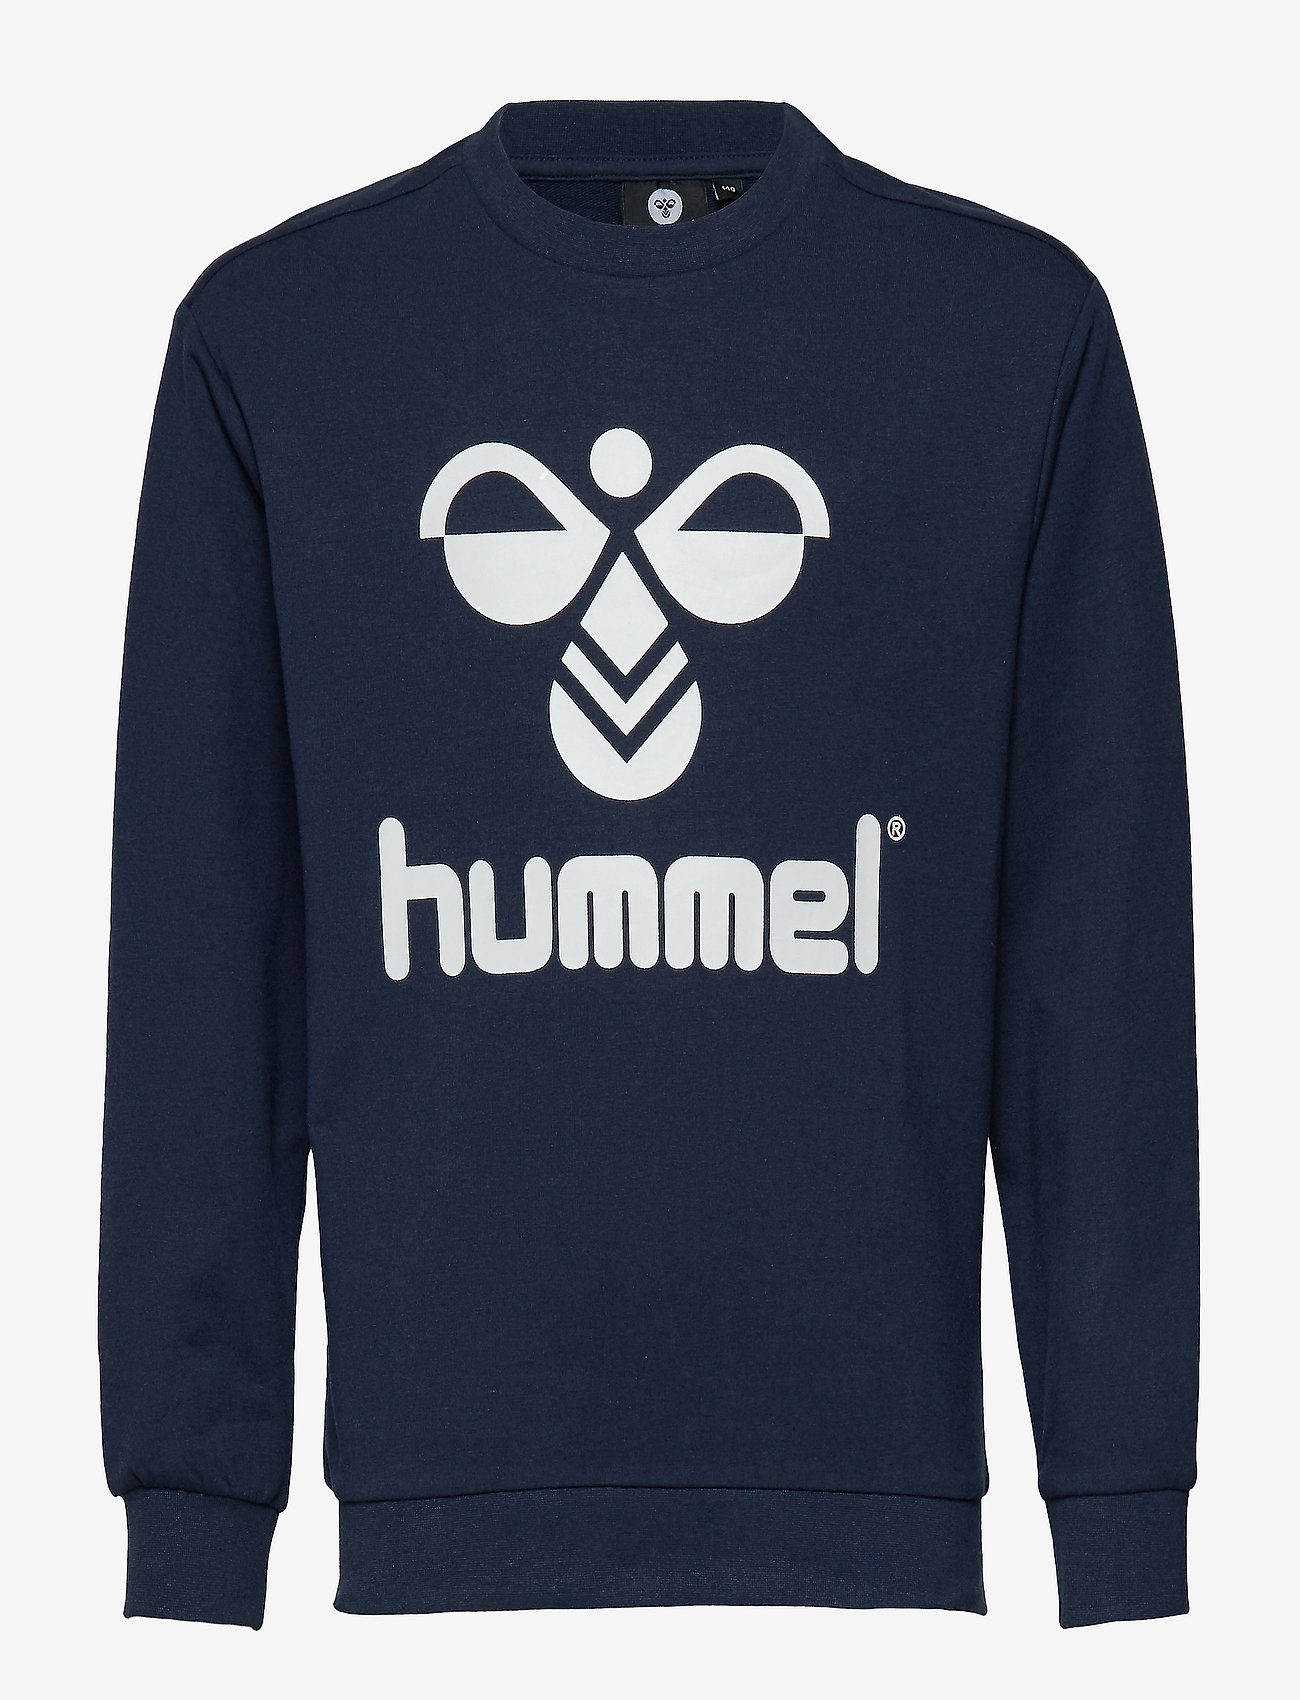 Hummel - HMLDOS SWEATSHIRT - bluzy - black iris - 0